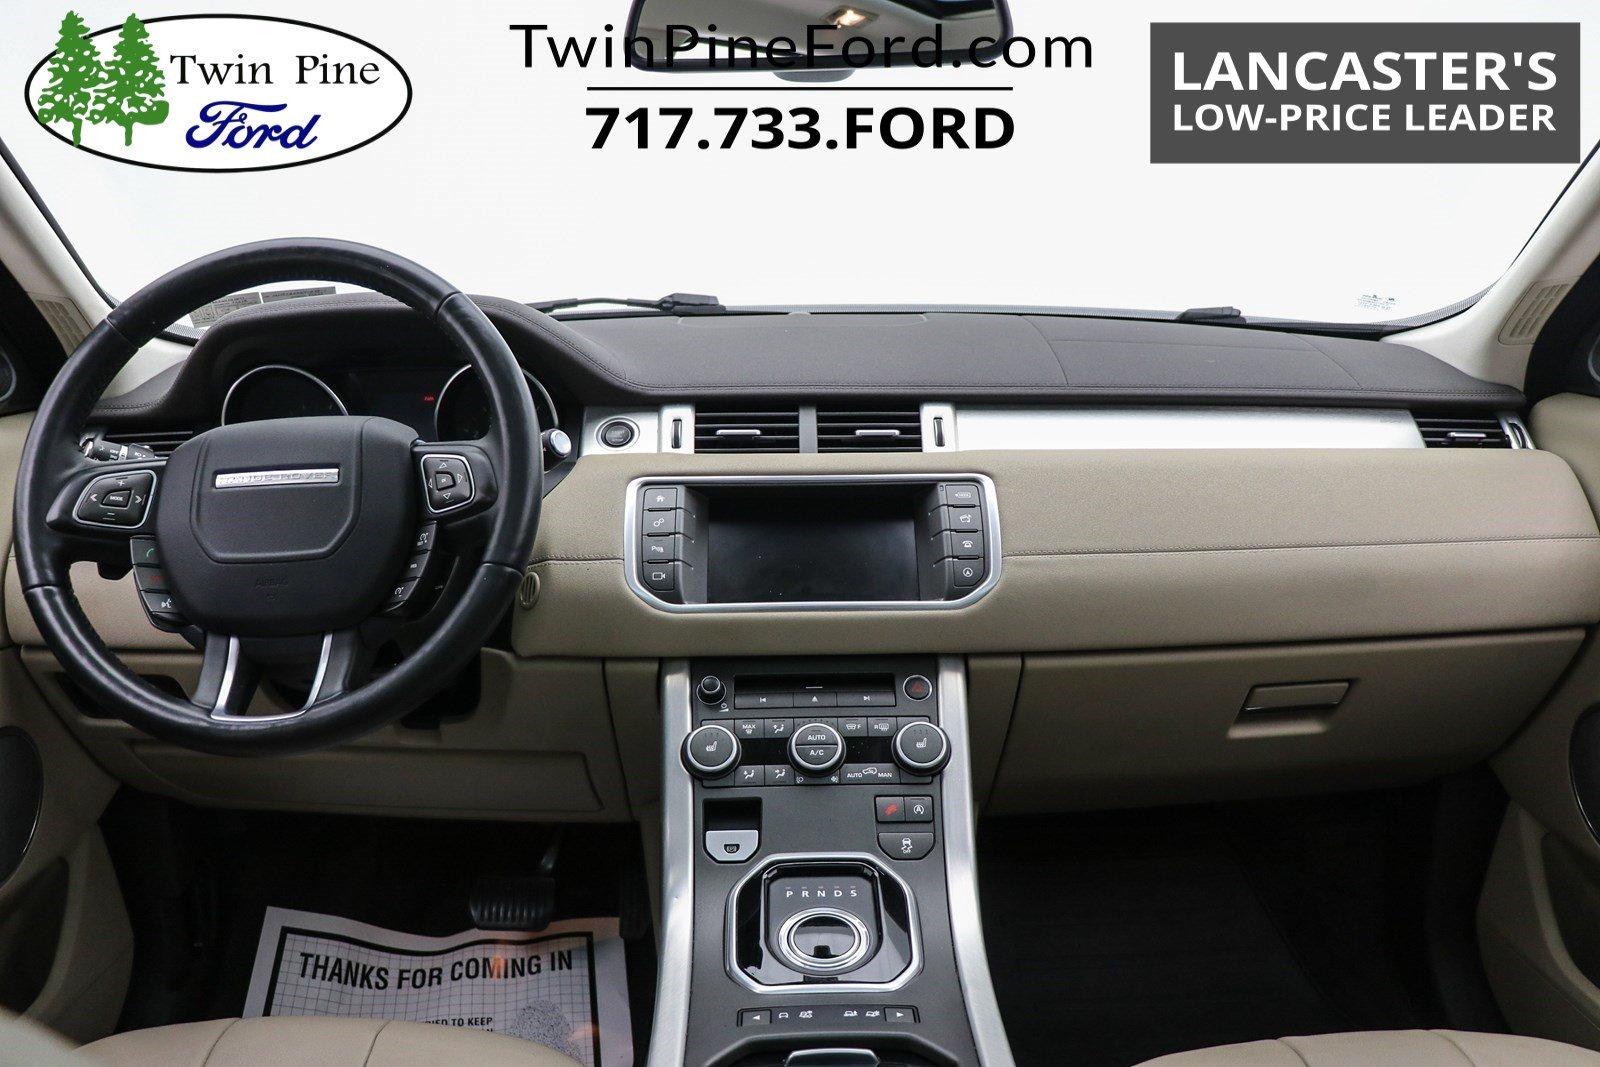 Used 2016 Land Rover Range Rover Evoque For Sale | Ephrata PA  SALVP2BG3GH083872